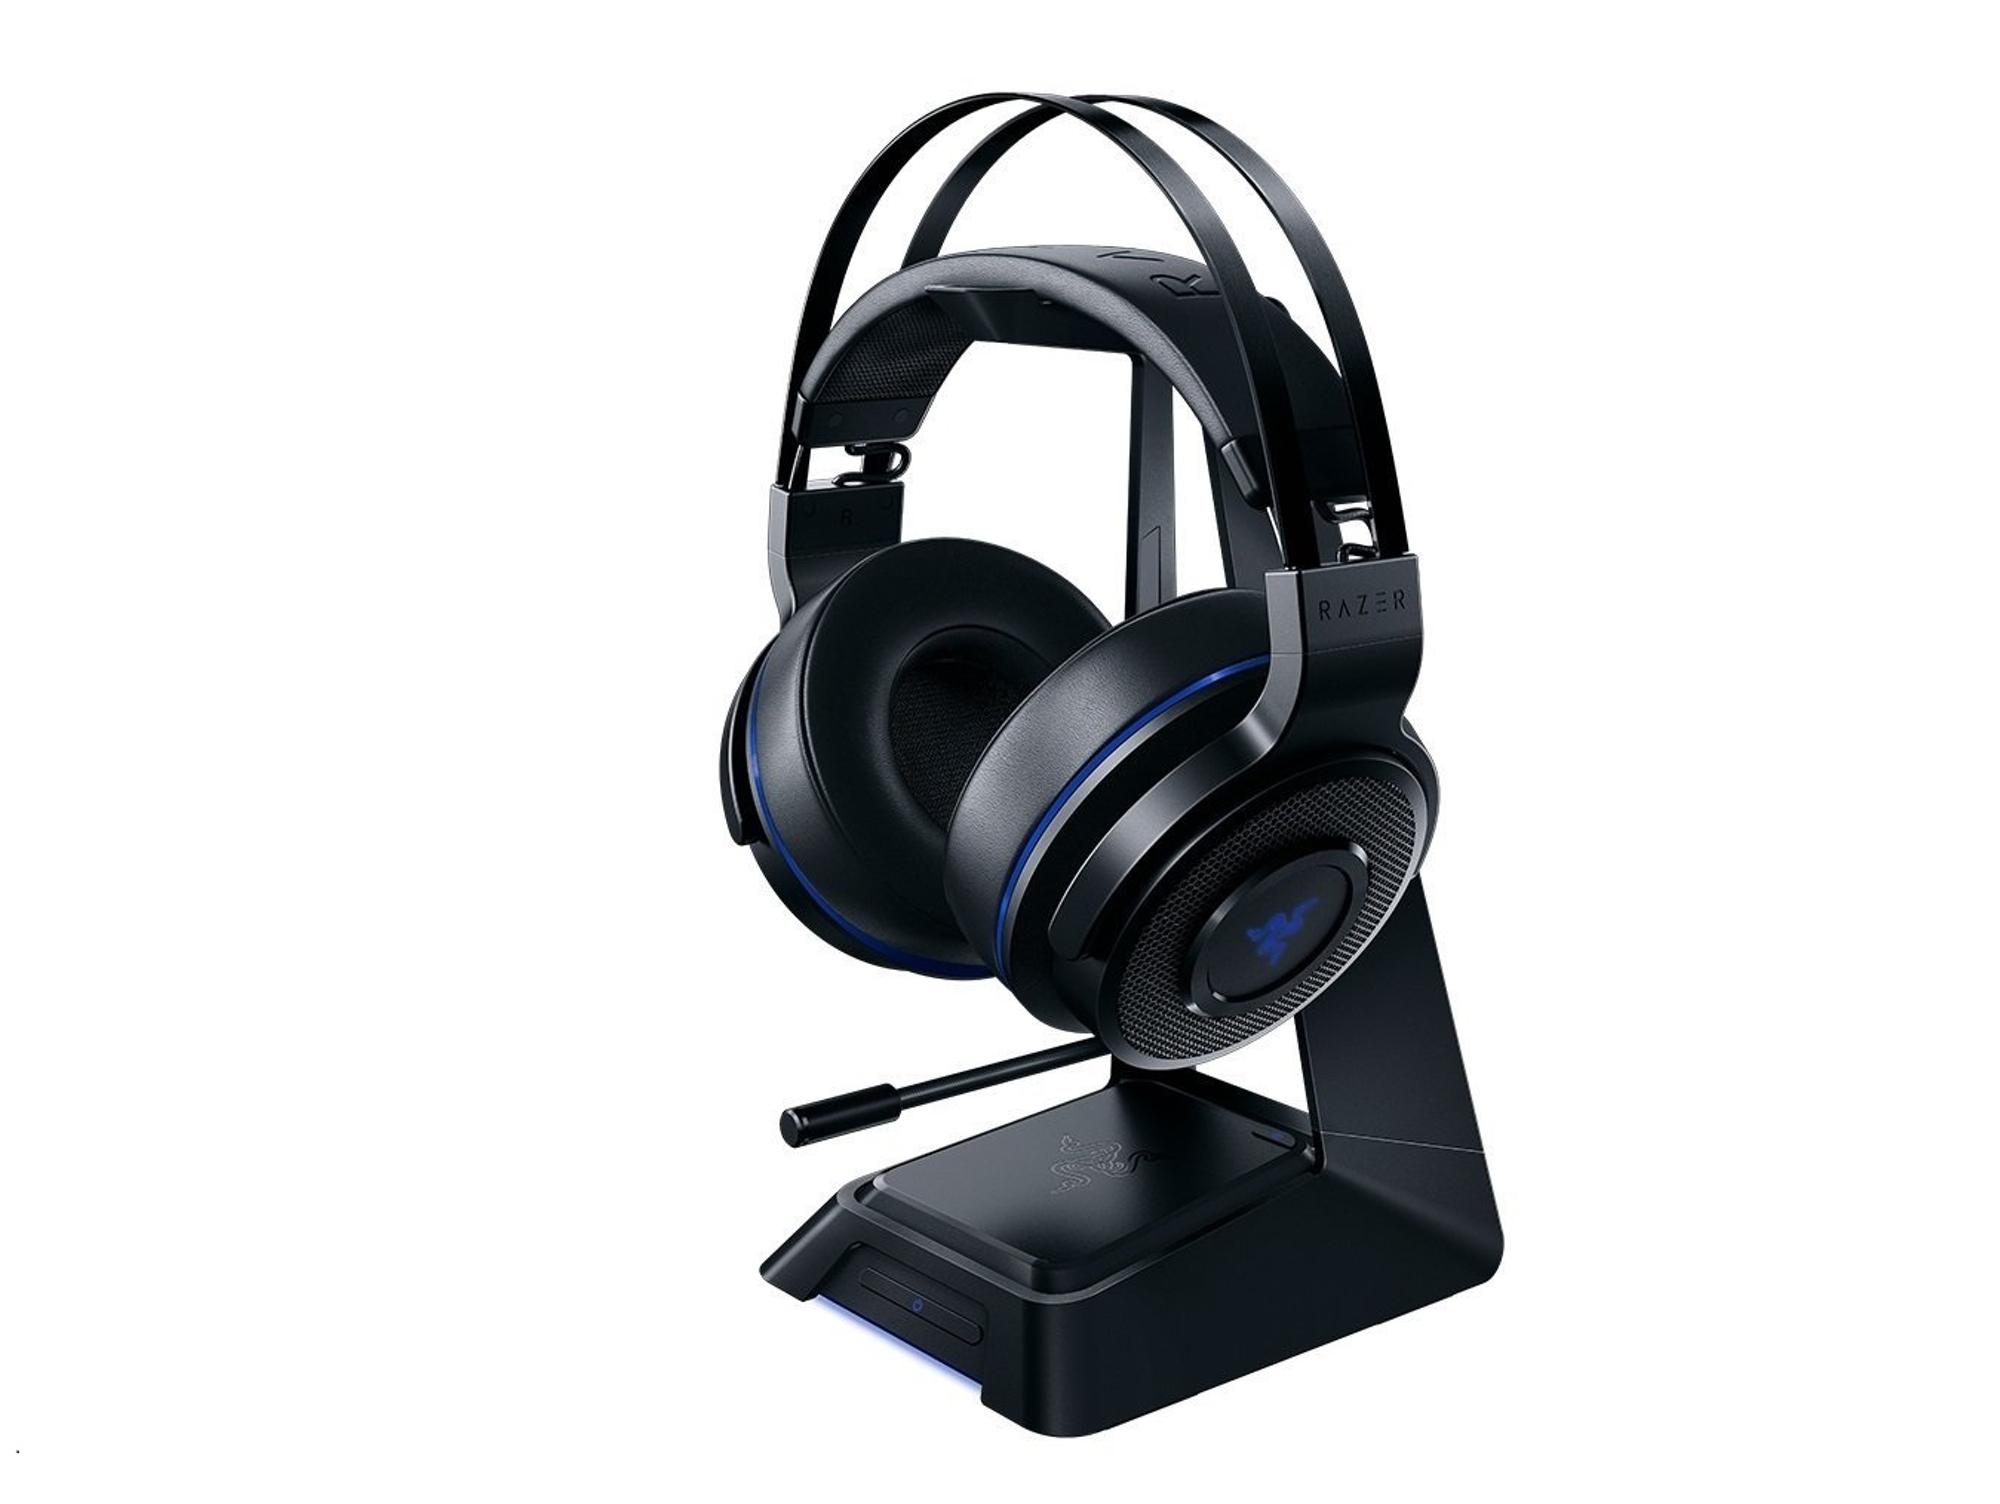 Razer Thresher Ultimate Dolby - Auriculares inalámbricos con sonido envolvente 7.1